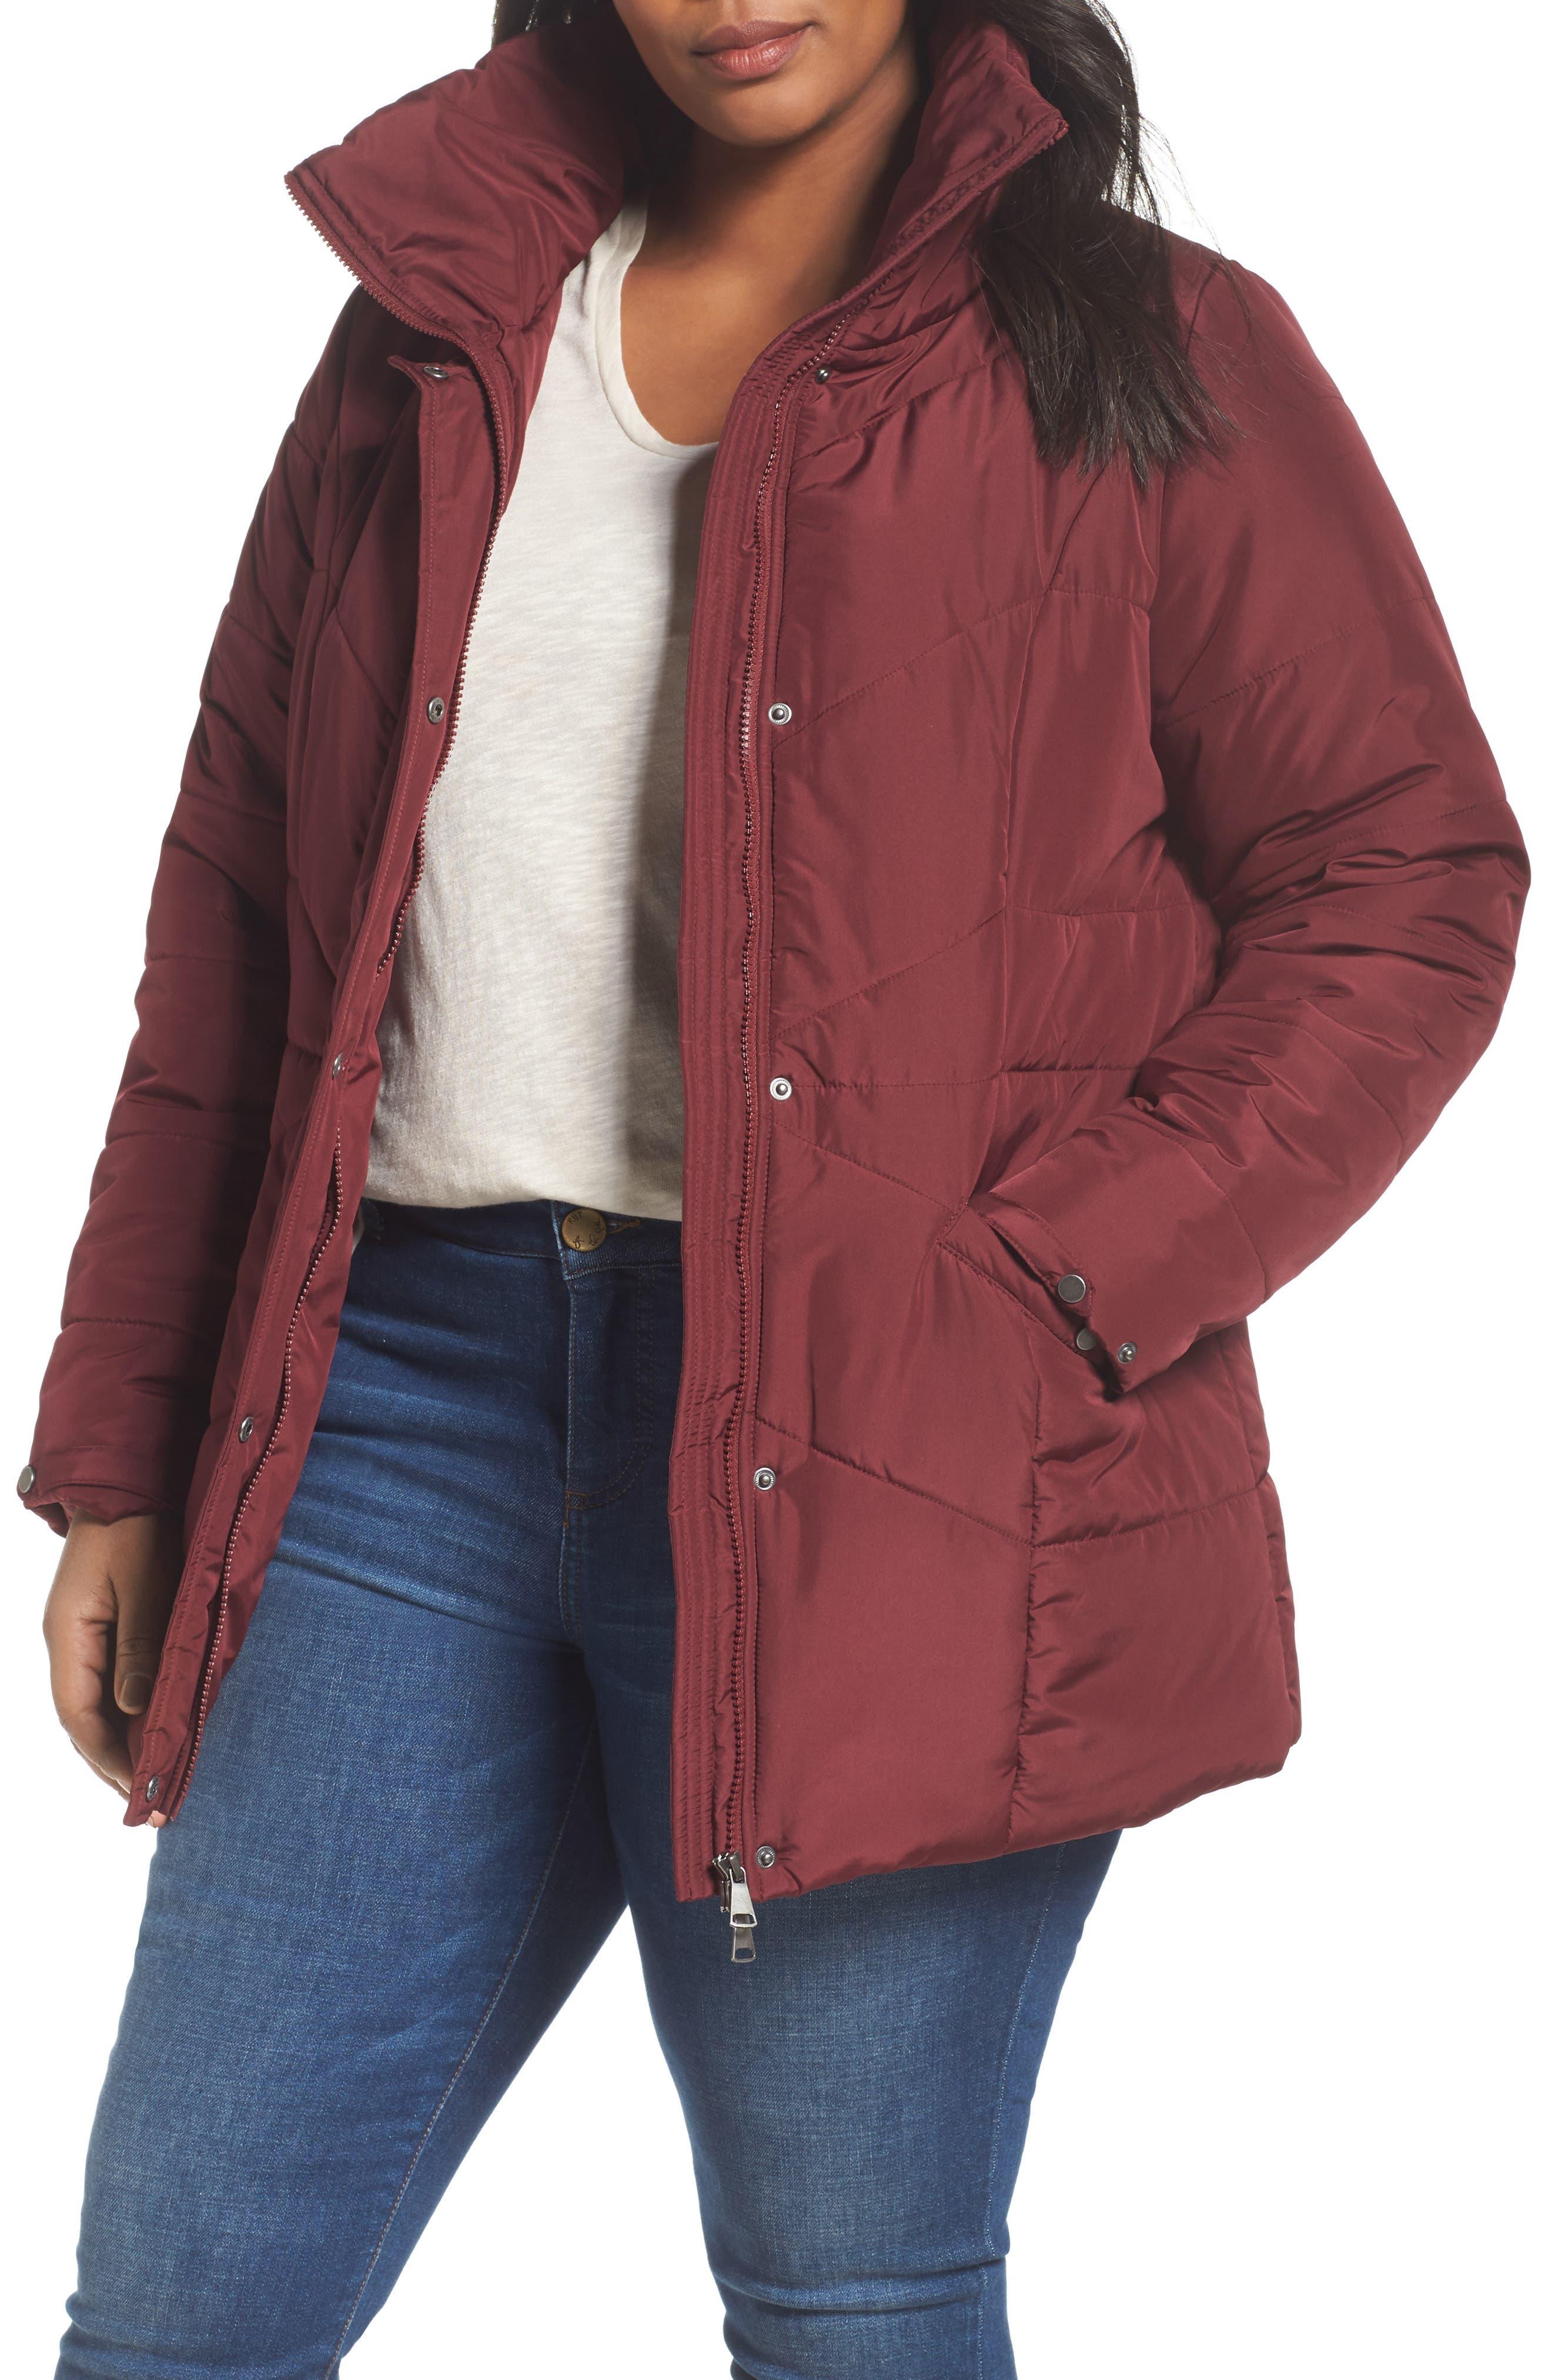 Main Image - JUNAROSE Valsi Puffer Jacket (Plus Size)